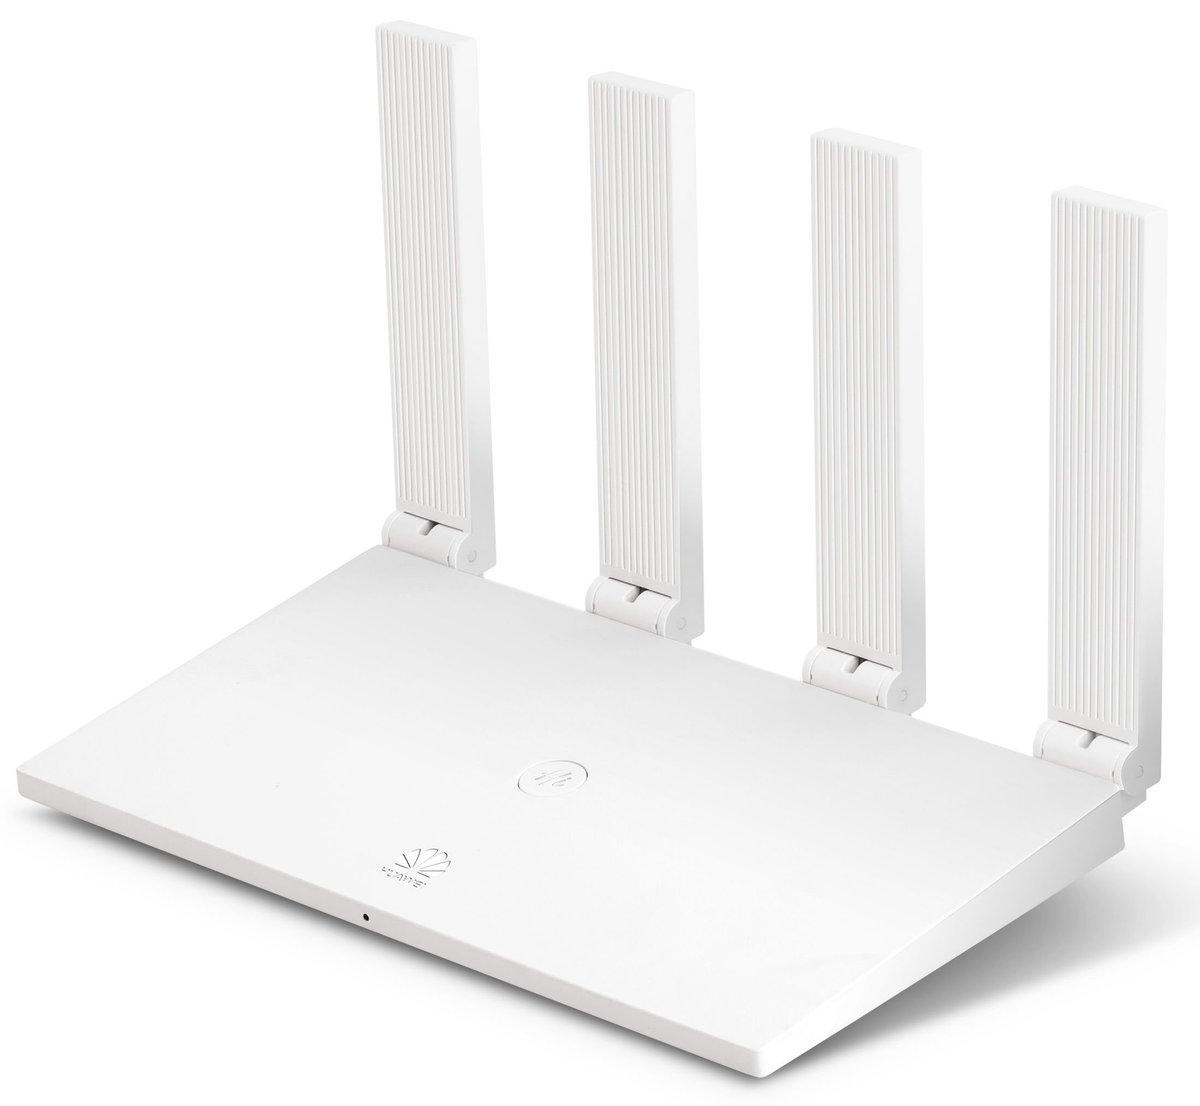 Huawei Wi-Fi  WS5200 AC1200 Gigabit Wirless Router